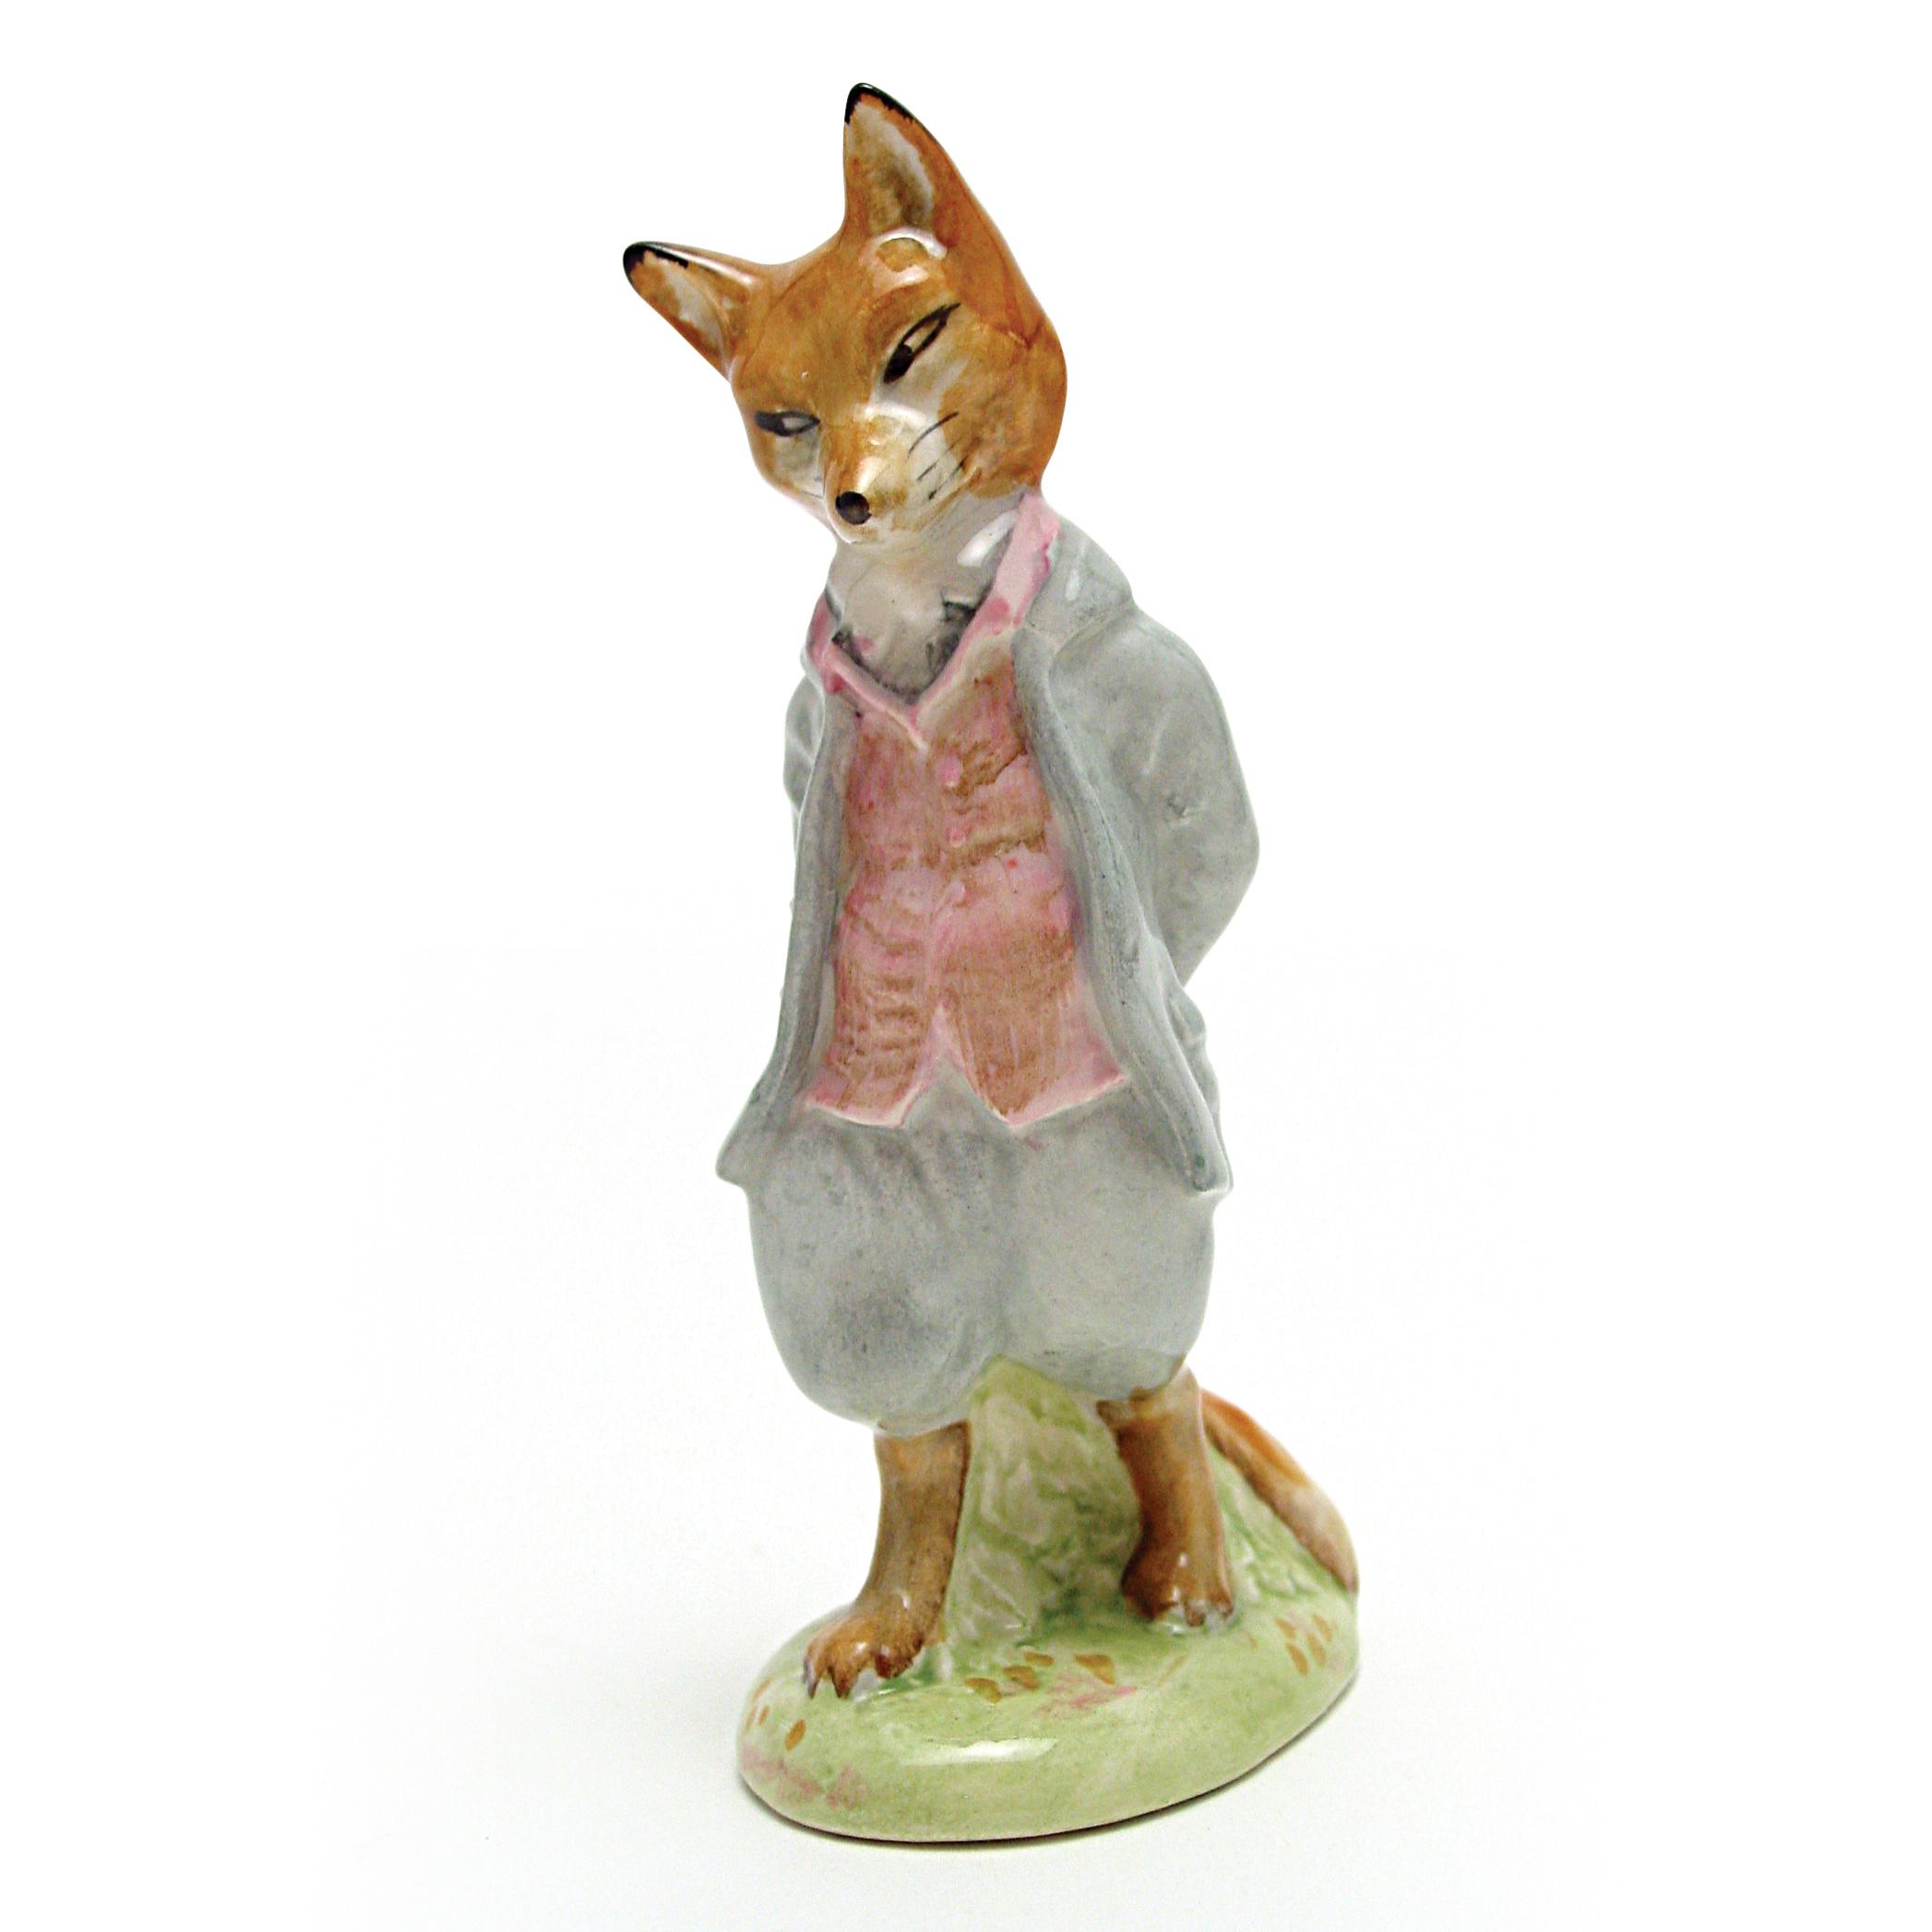 Foxy Whiskered Gentleman - Beswick - Beatrix Potter Figurine